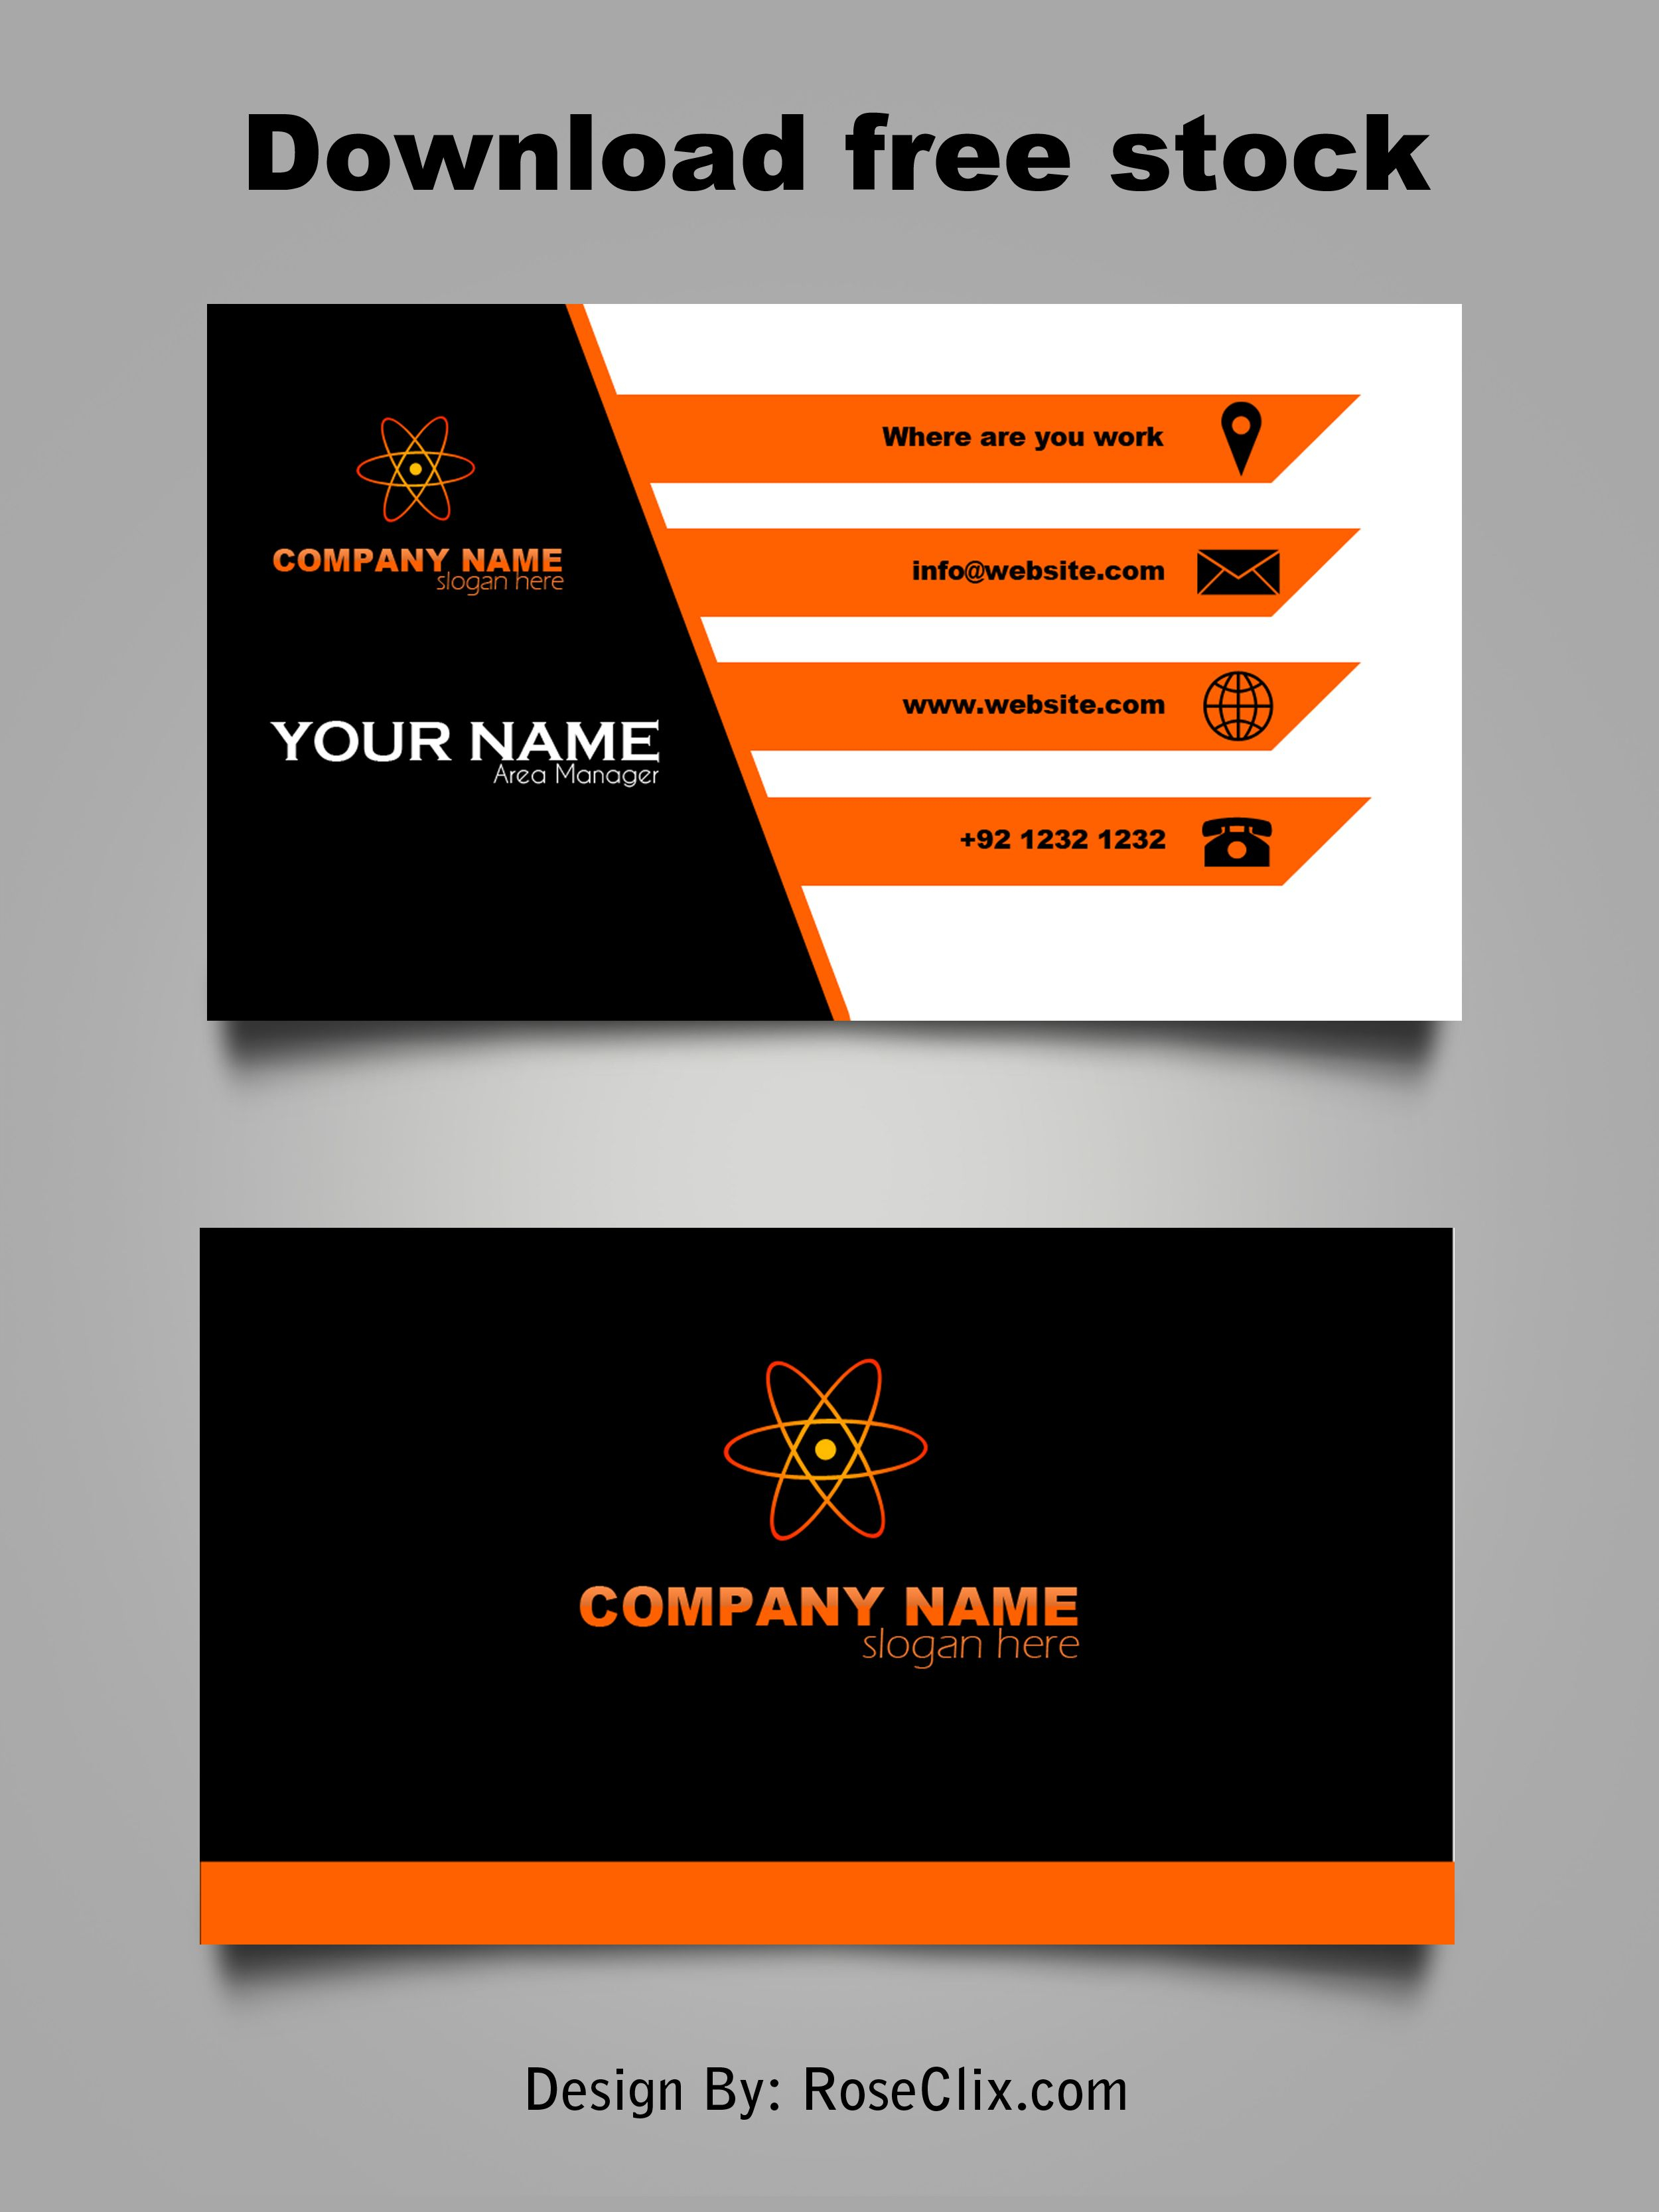 Business Card Template Free Downloads Psd Fils. | Business In Templates For Visiting Cards Free Downloads